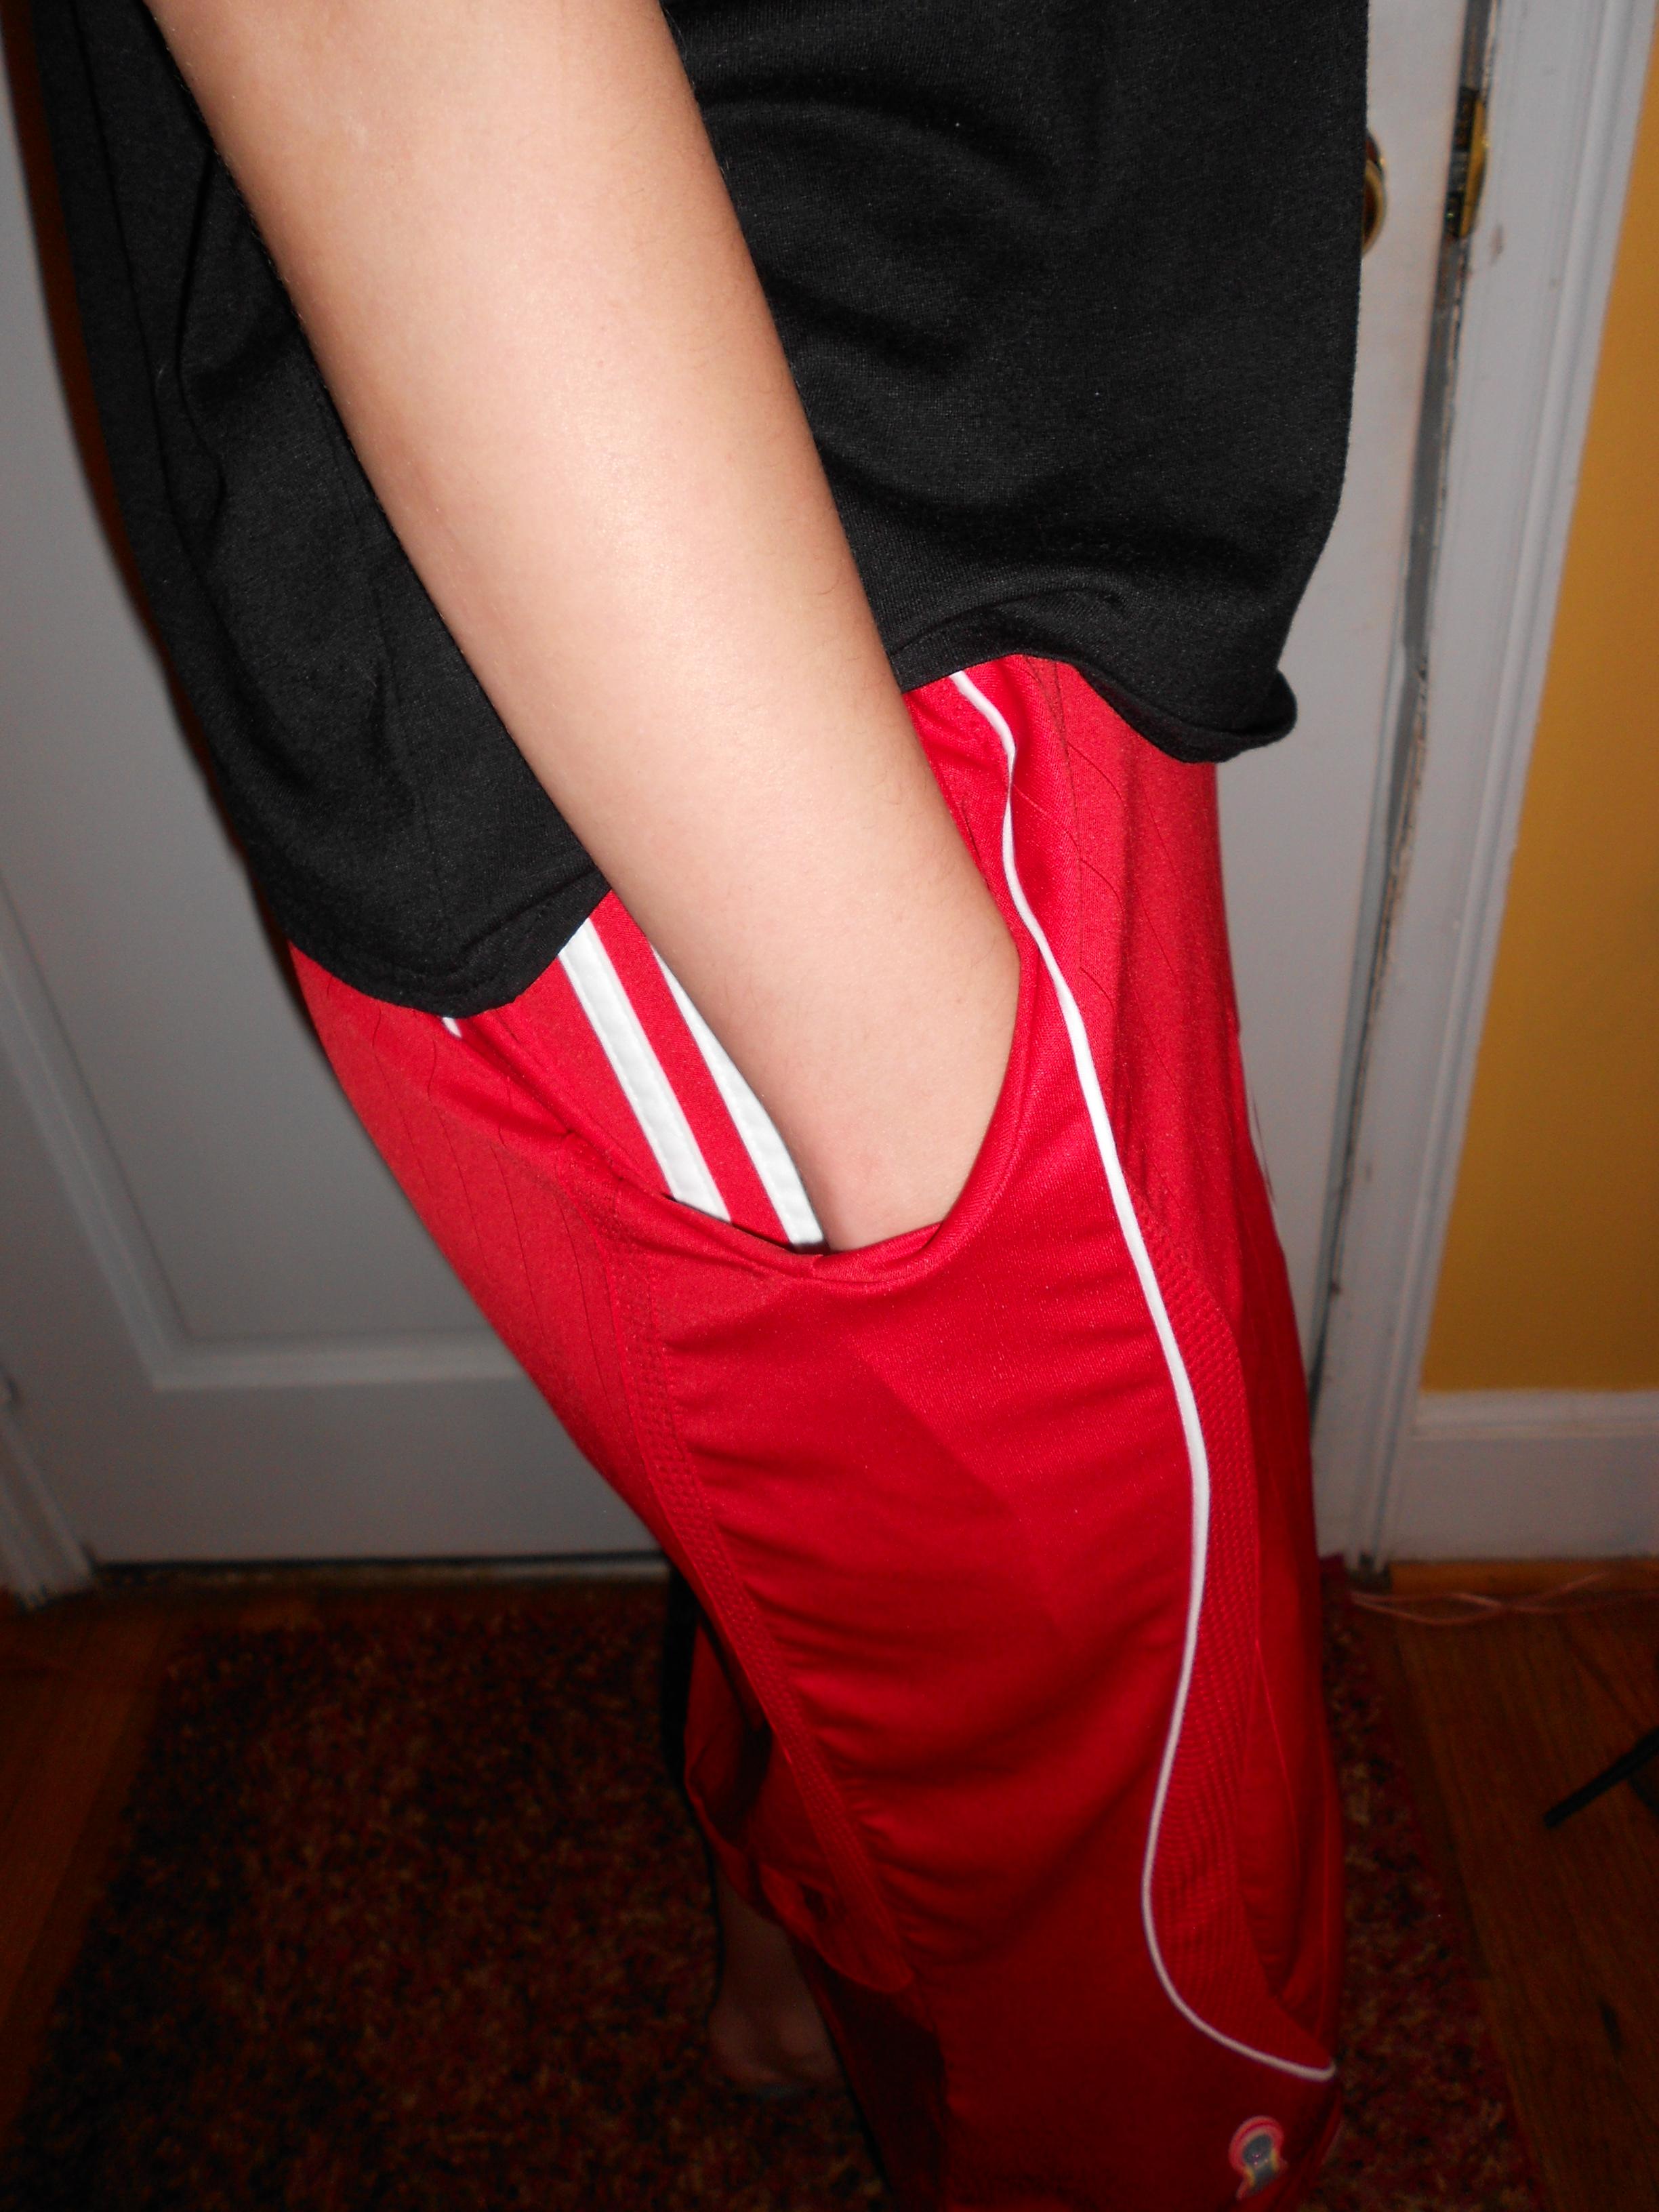 Day 73: My Football Skirt 5